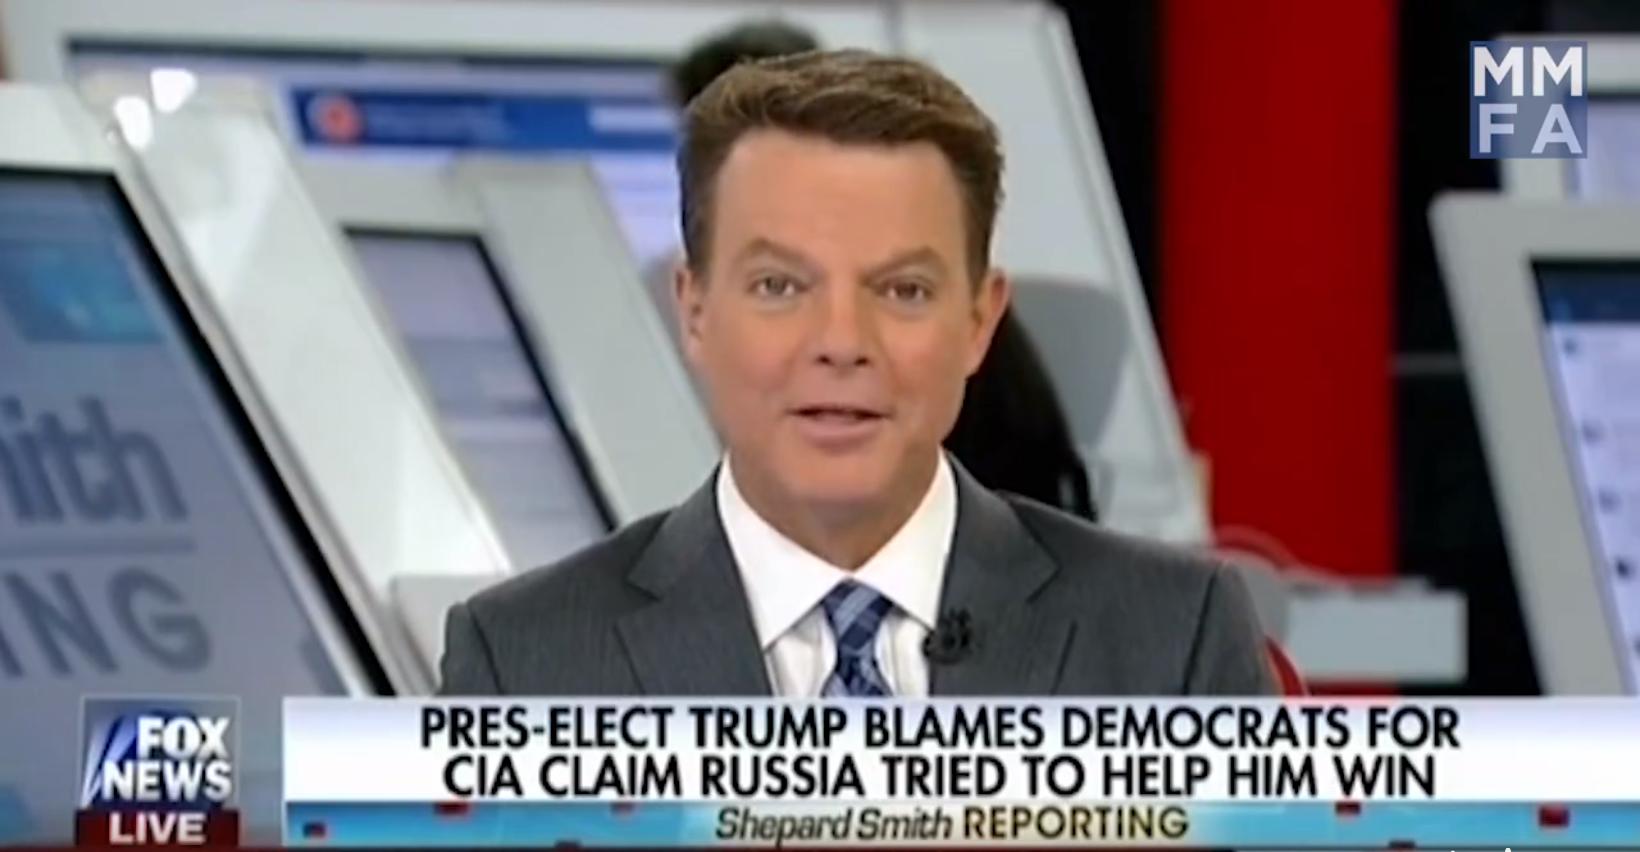 Video: Even Fox News Calls Bullshit on Trump's Response to Russia's Election Hacks